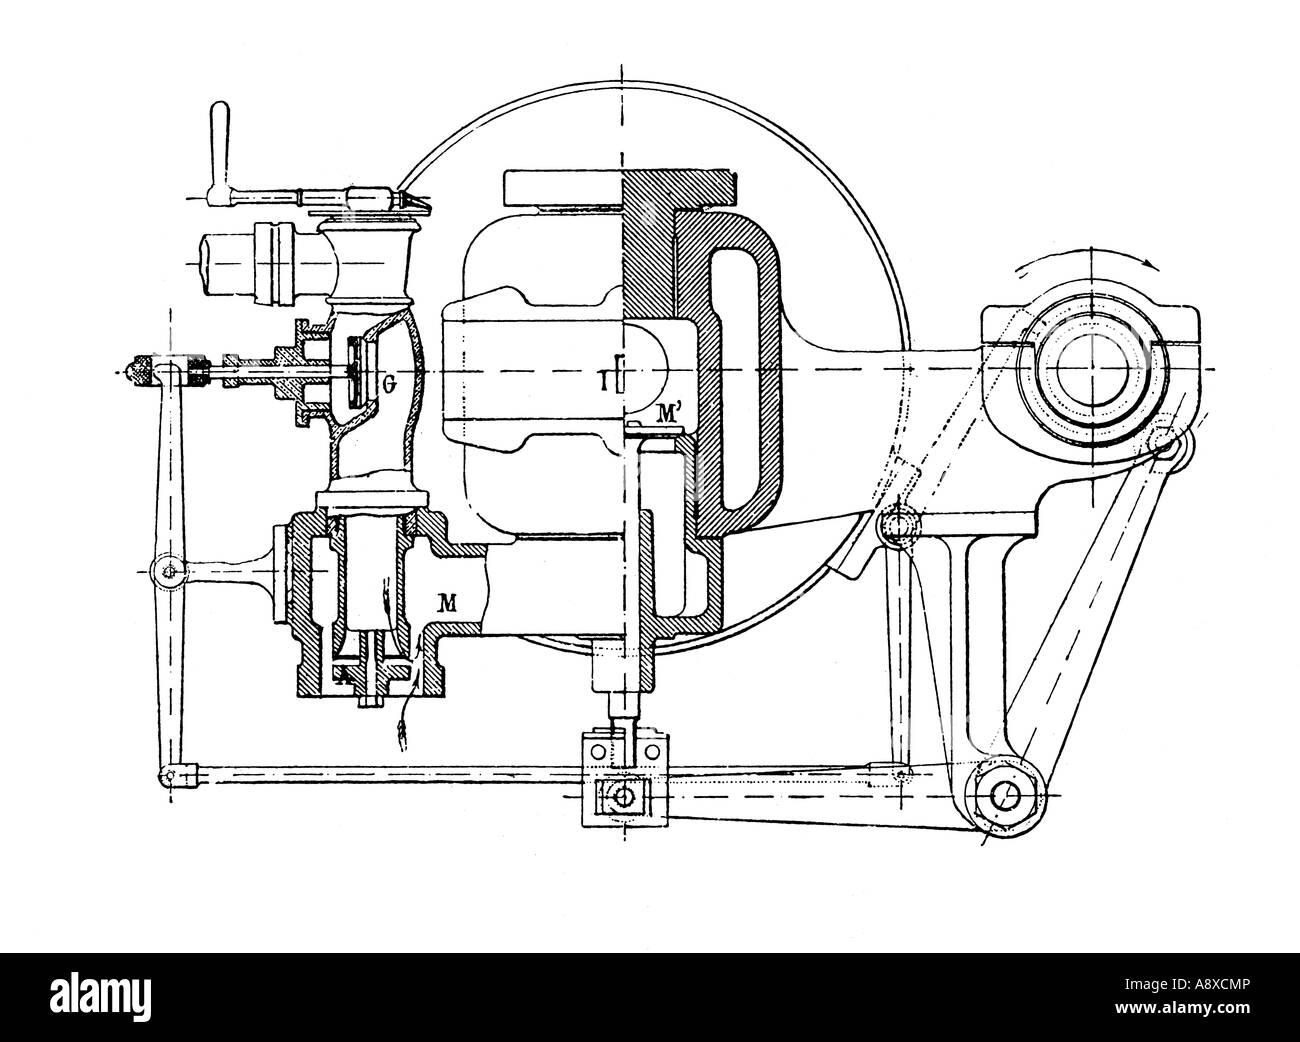 hight resolution of otto gas burning engine valves stock image